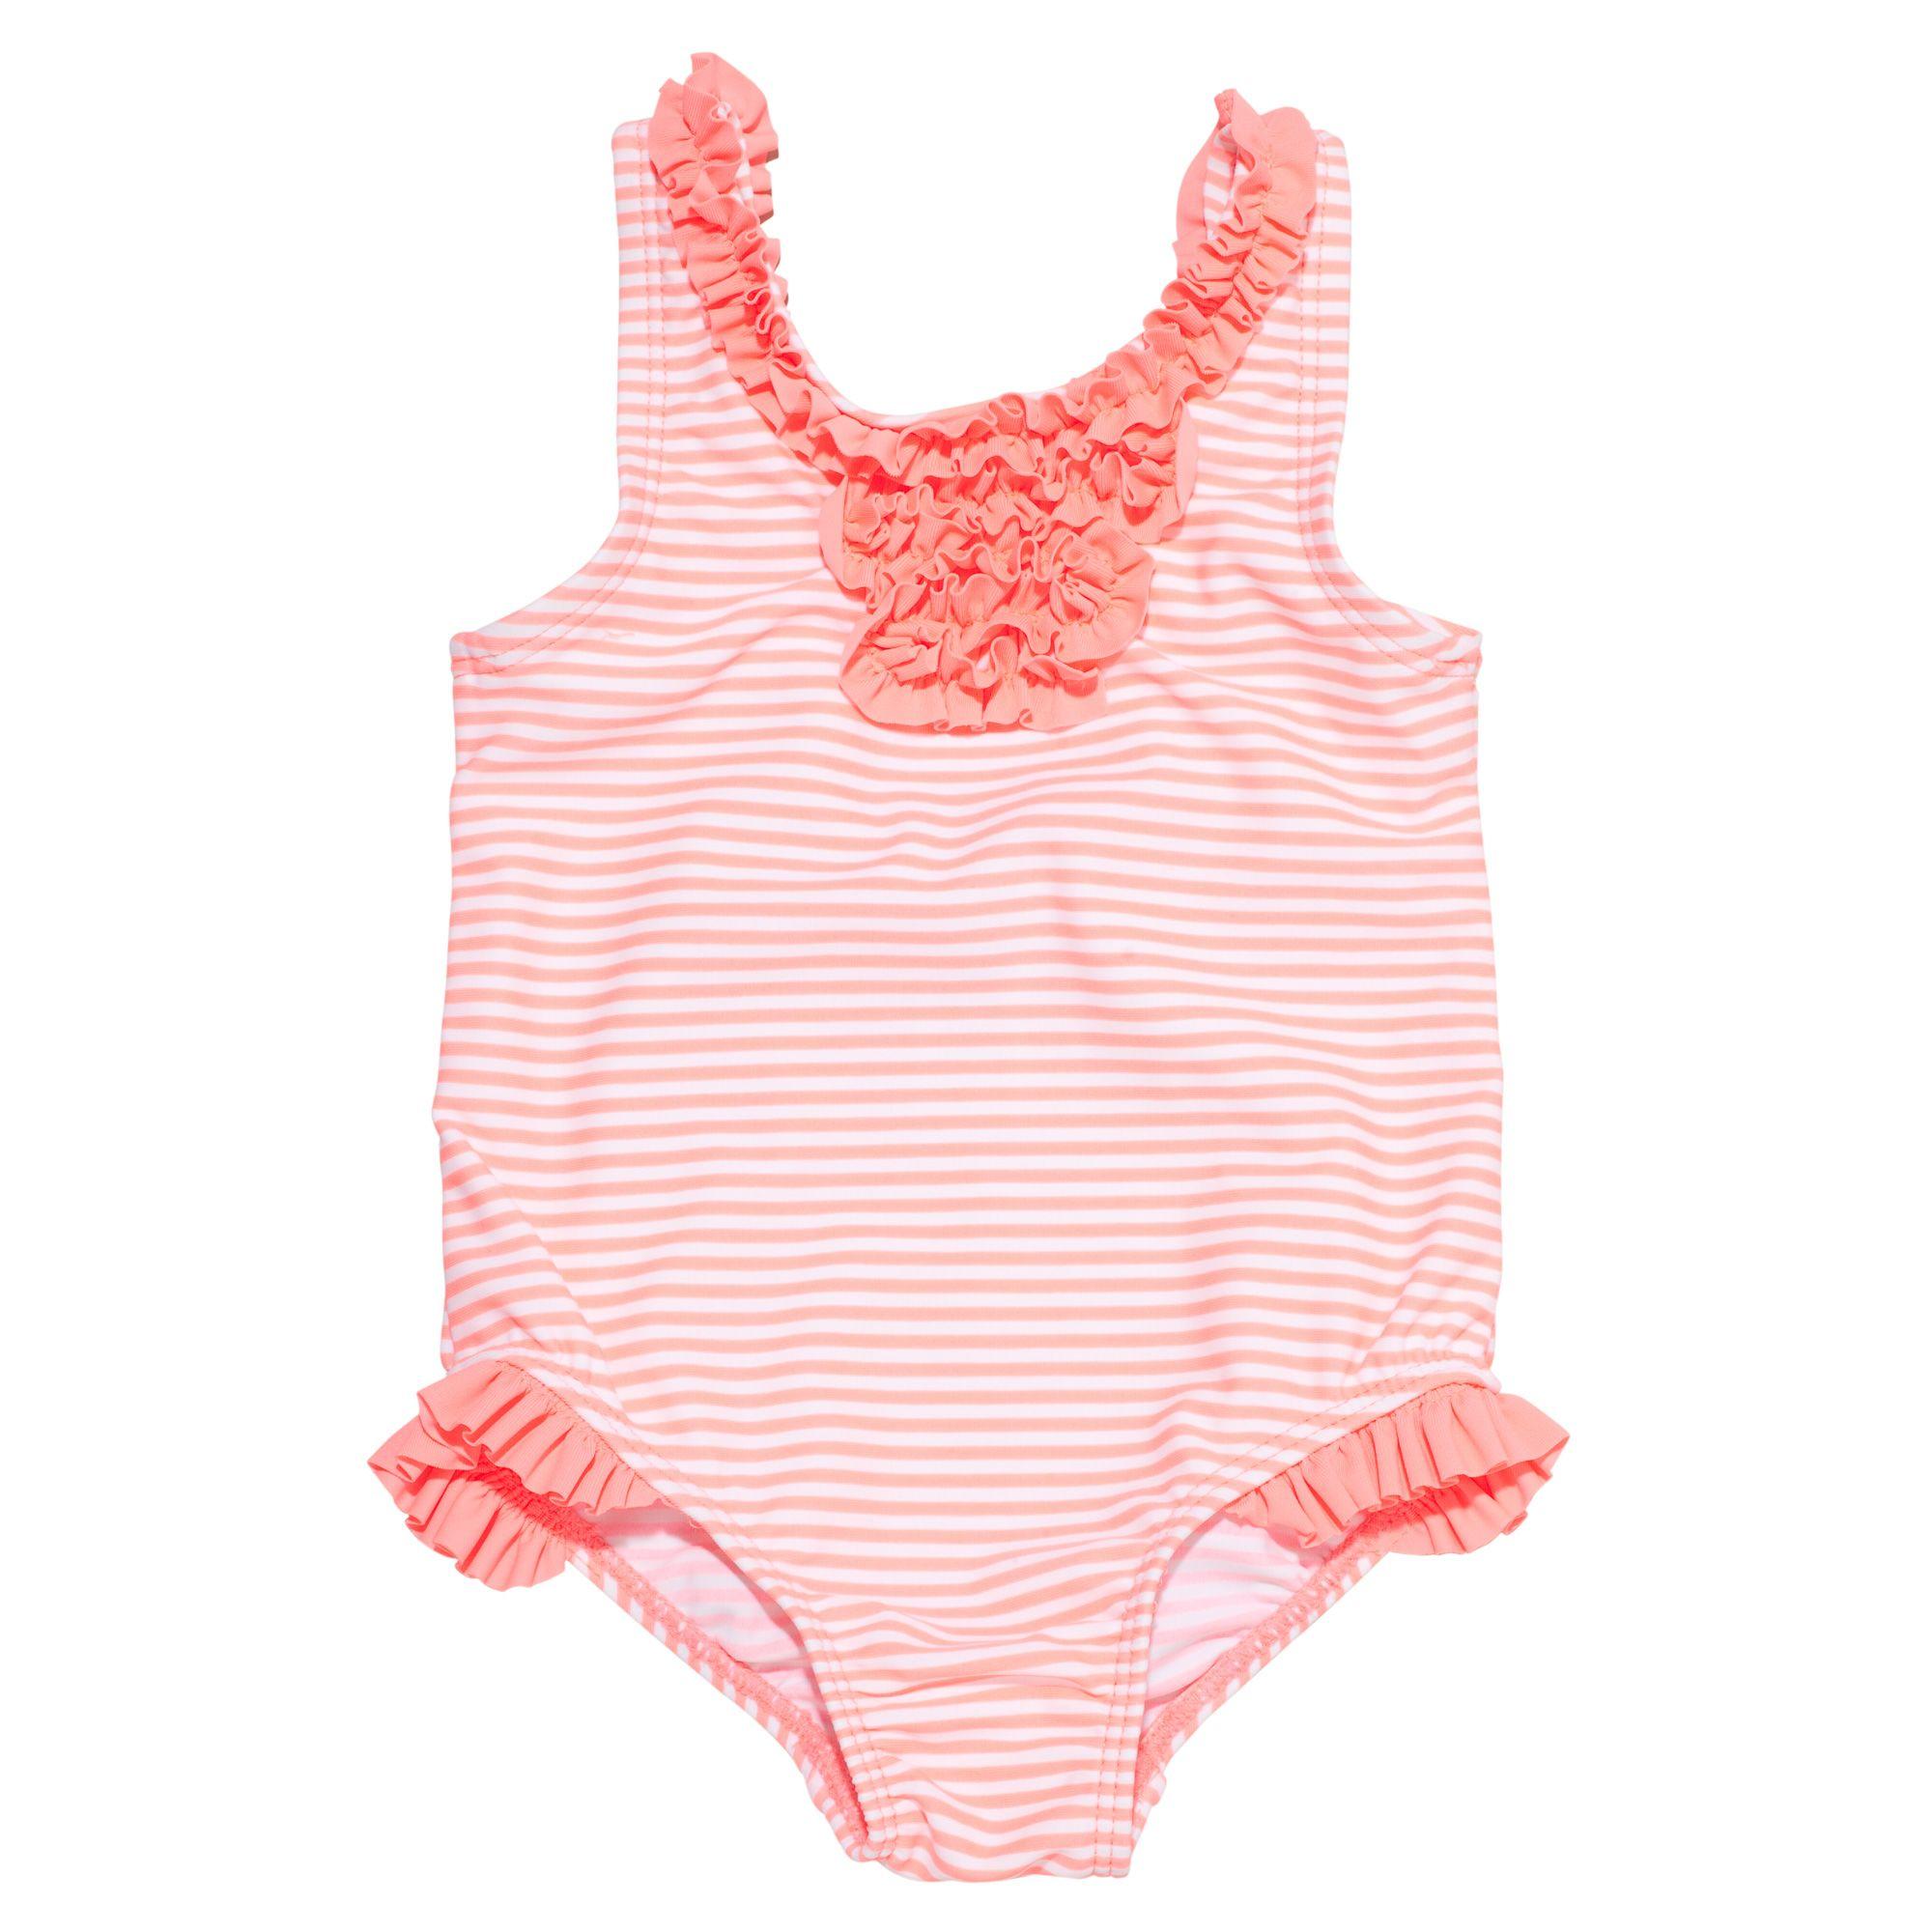 Striped 1 Piece Swimsuit Baby Girl Swimwear